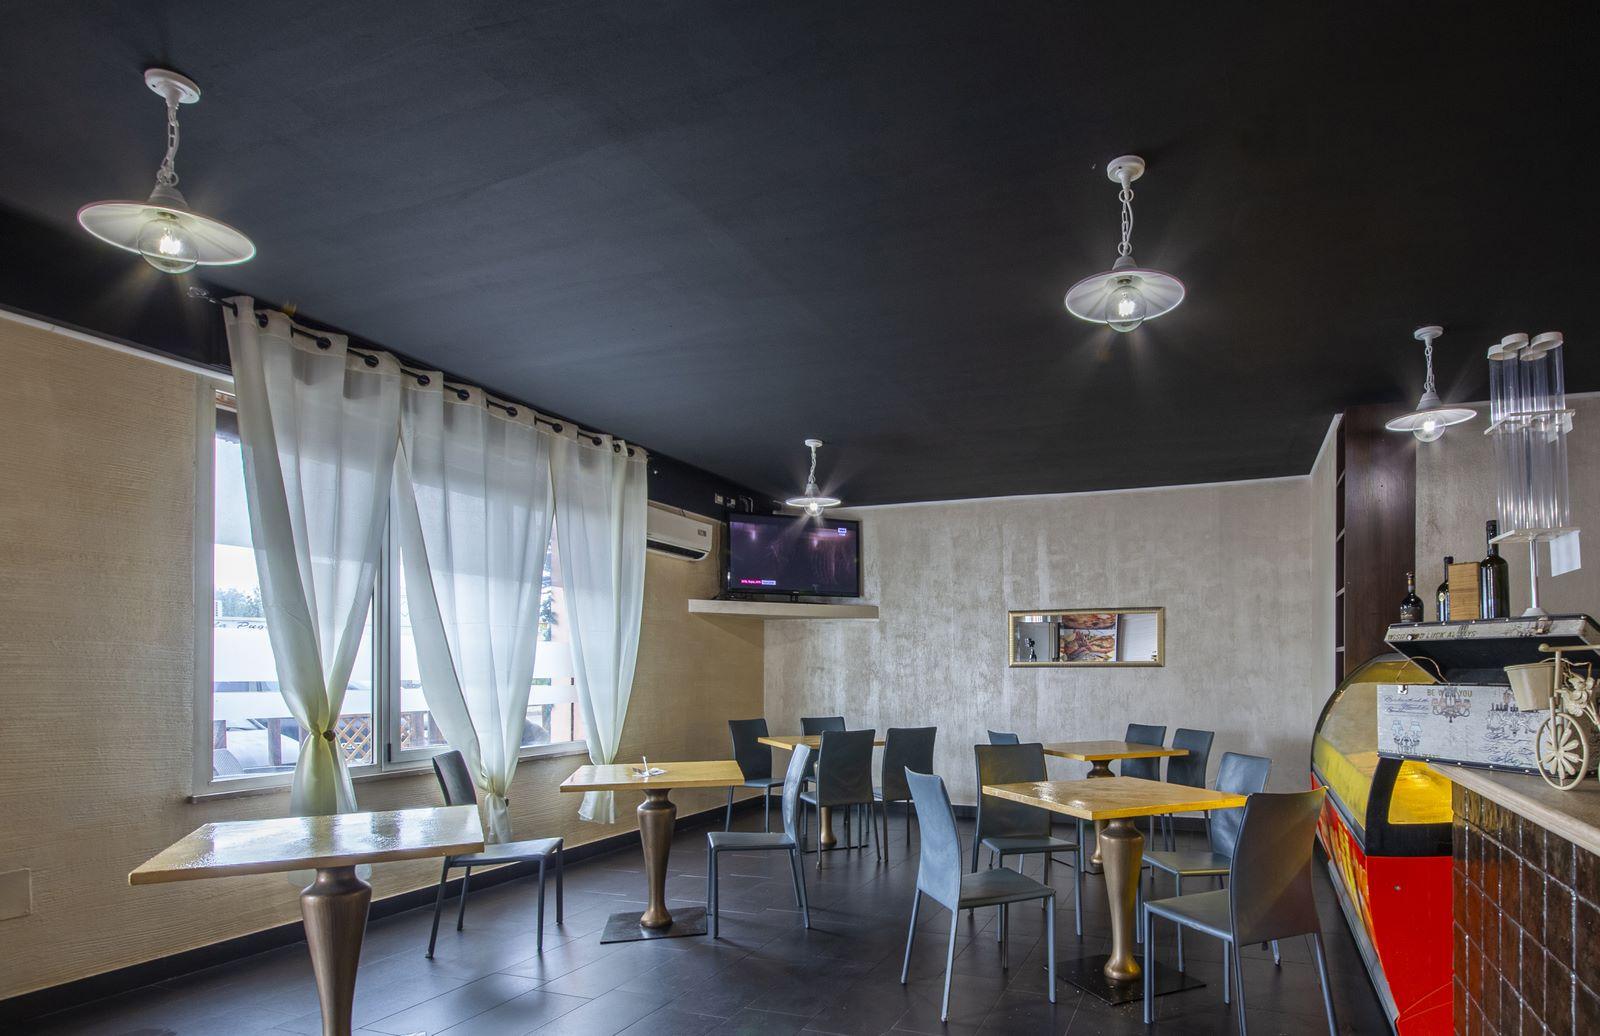 Ristorante Pizzeria Bar Cafè